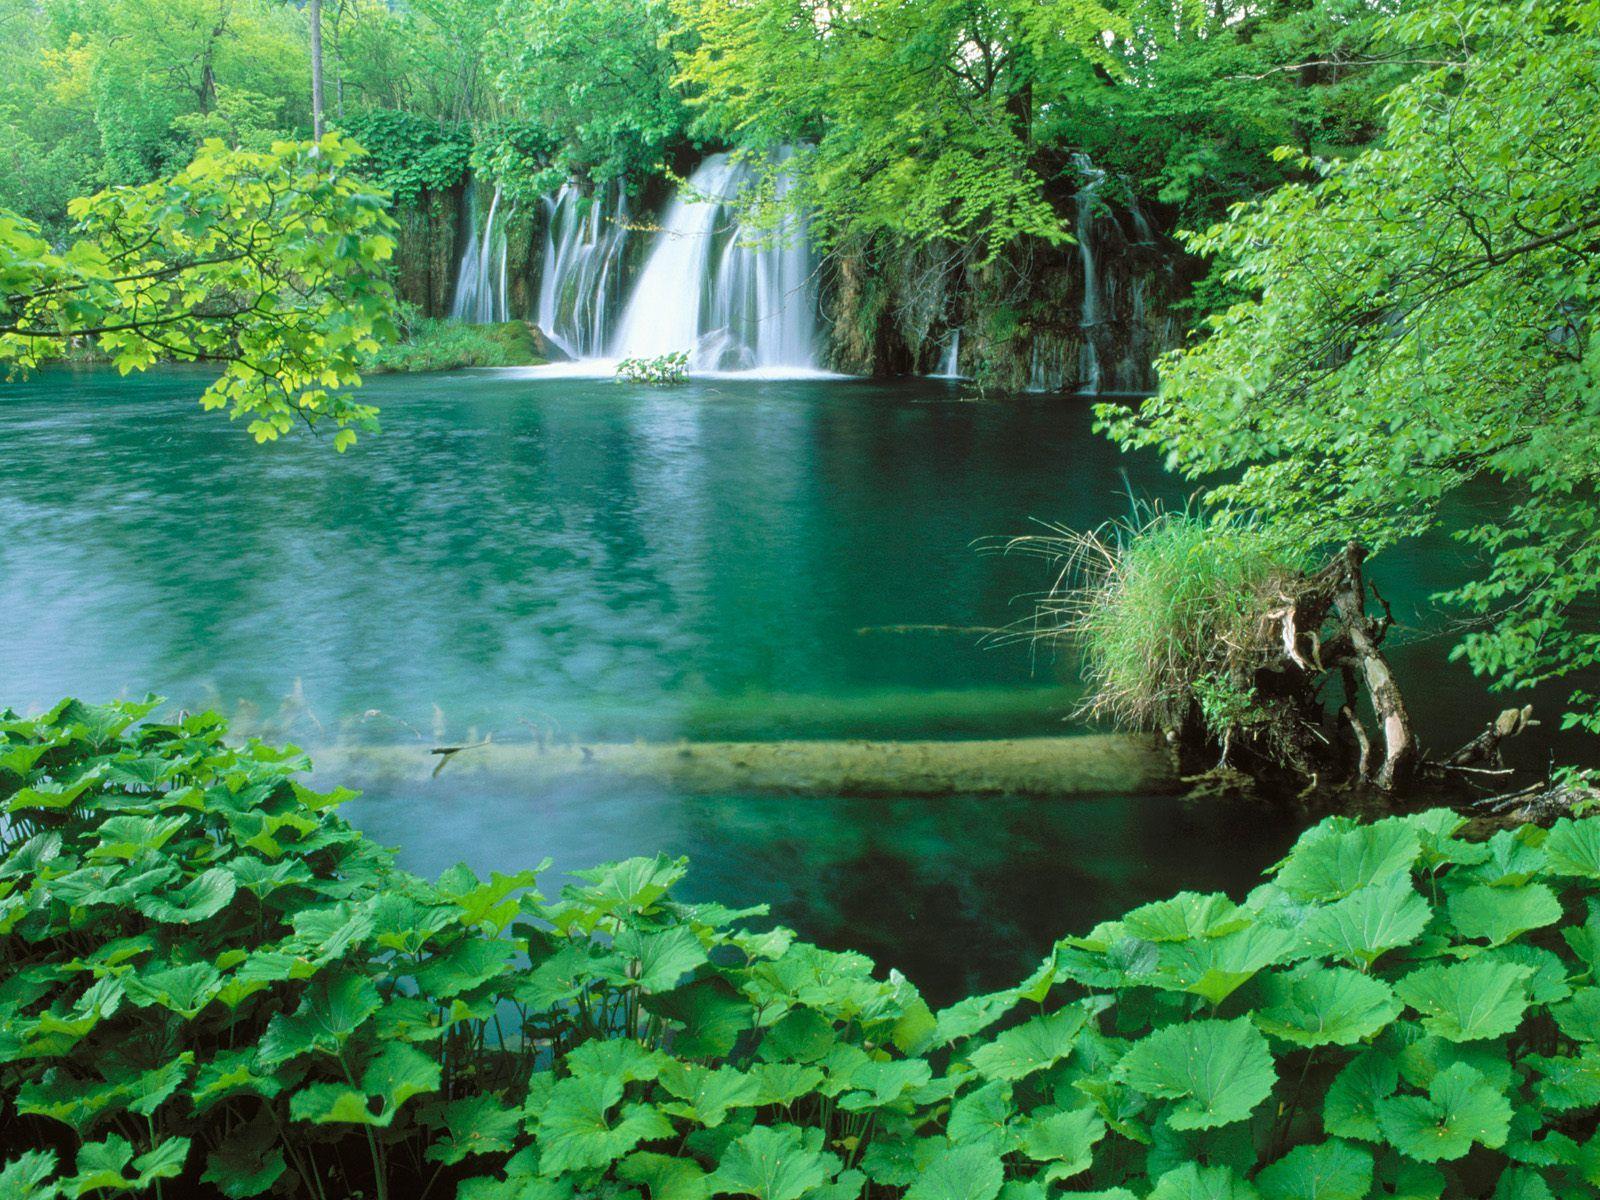 Beautiful Pics Of Nature Beautiful Nature Scene Nature Wallpapers Beautiful Nature Scenes Plitvice Lakes Plitvice Lakes National Park